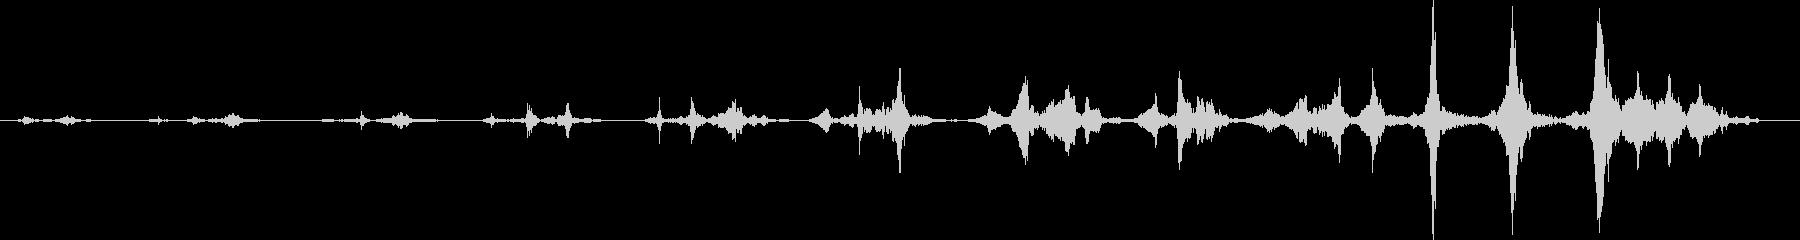 【SF】機械音 ワープ_04の未再生の波形